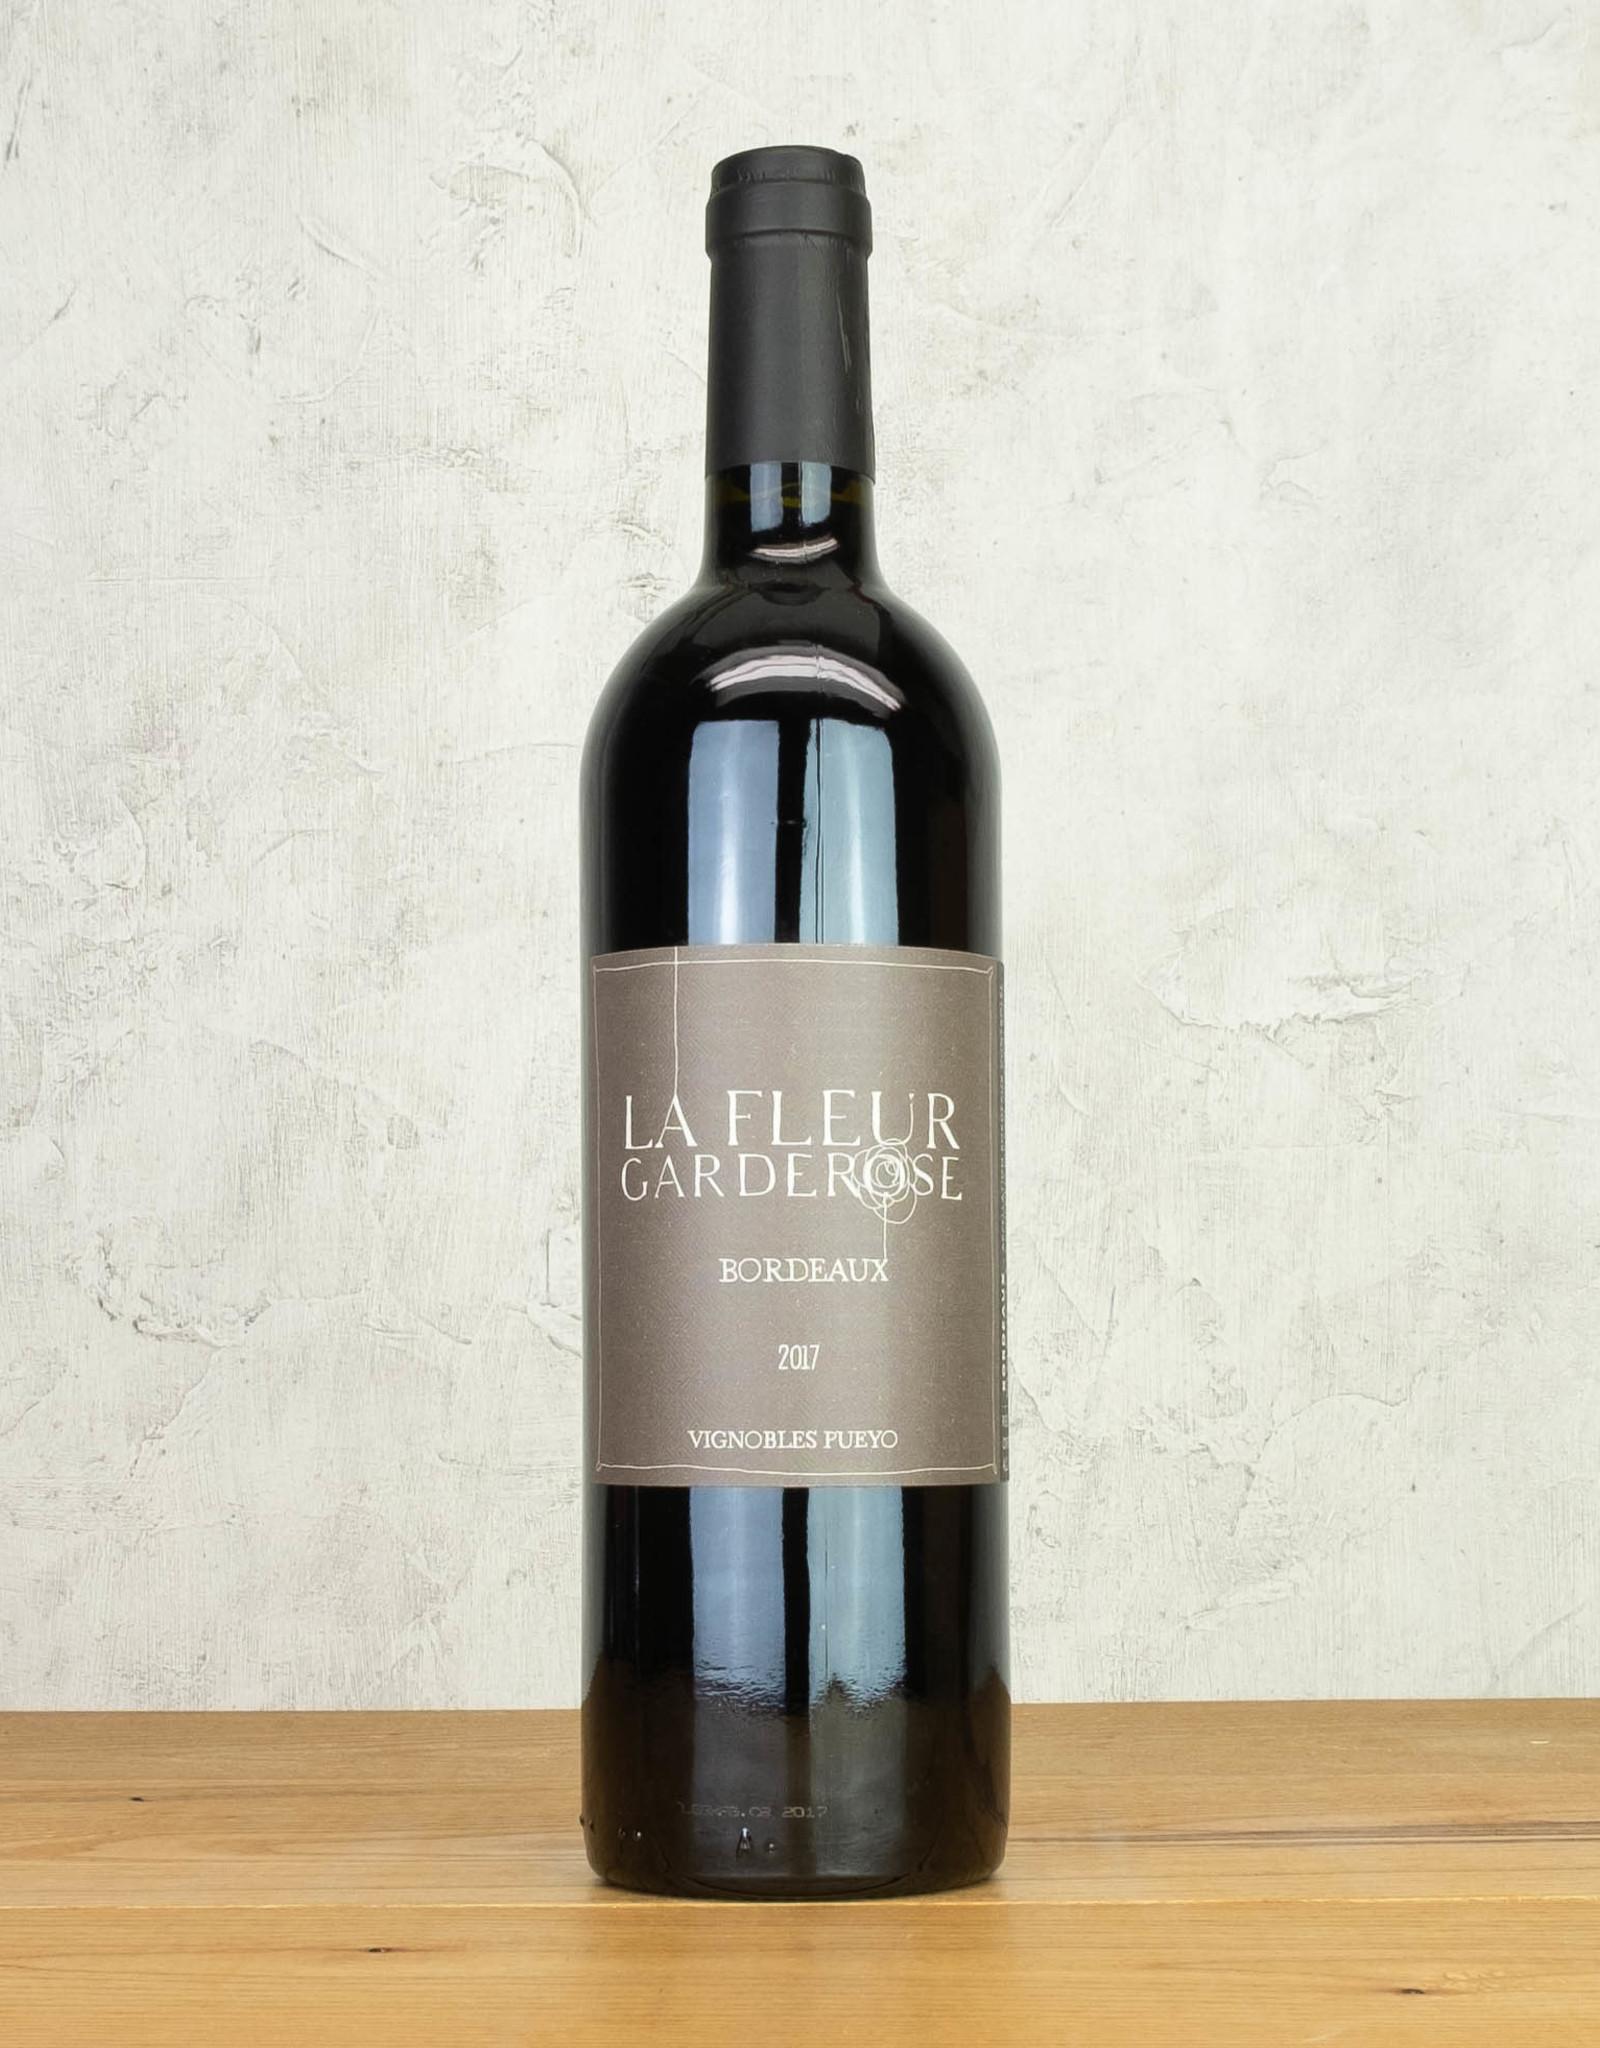 Pueyo La Fleur Garderose Bordeaux